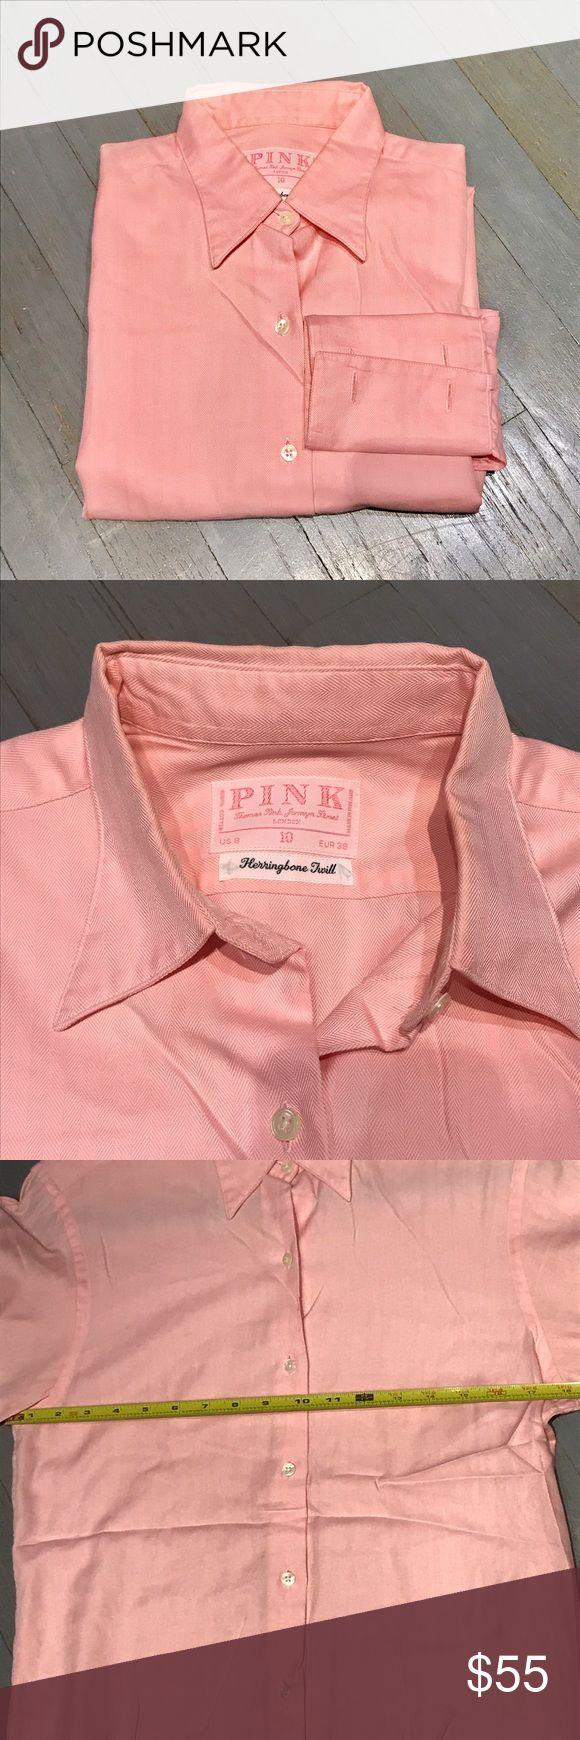 Thomas Pink pink herringbone twill French cuff Thomas Pink dark pink herringbone twill French cuff button down shirt. US 8/ TP 10 ASOS Tops Button Down Shirts